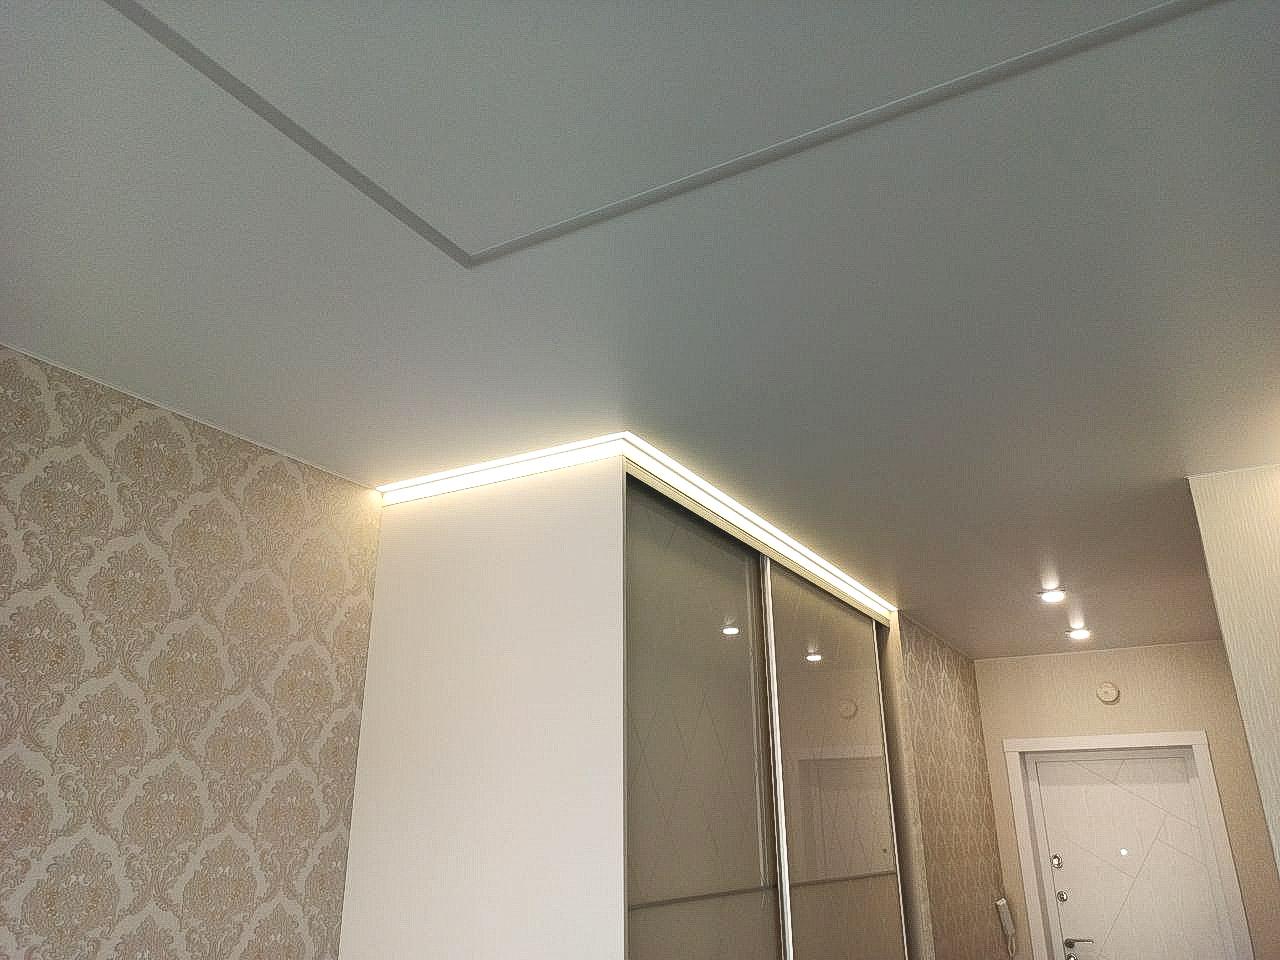 Потолок в зале с парящими линиями.